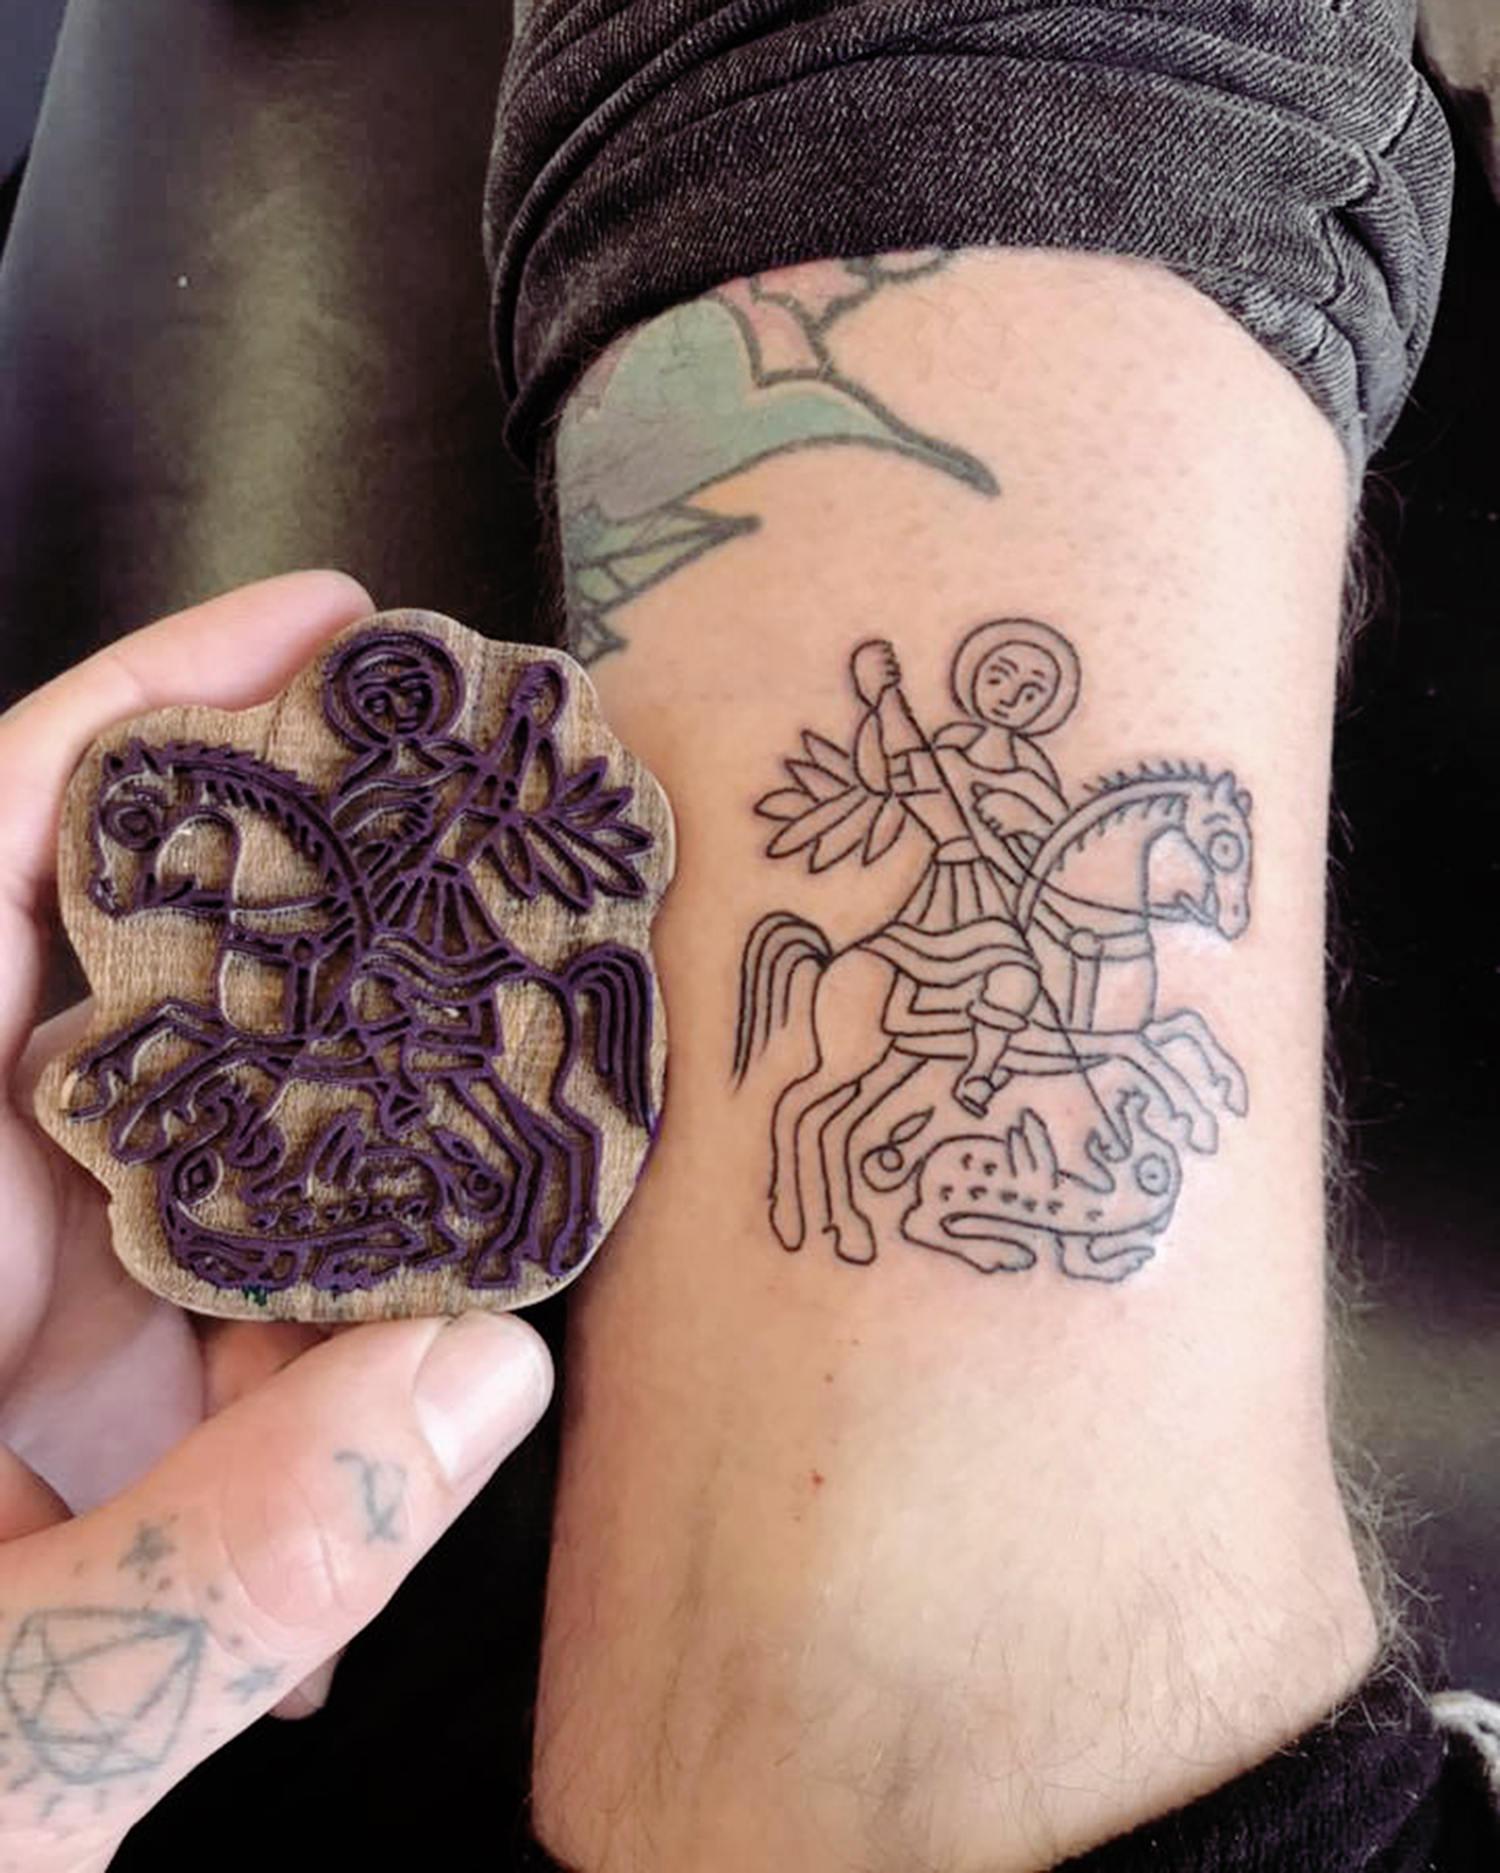 marc newton, the skin sorcerer studio, coptic old tattoo stamps